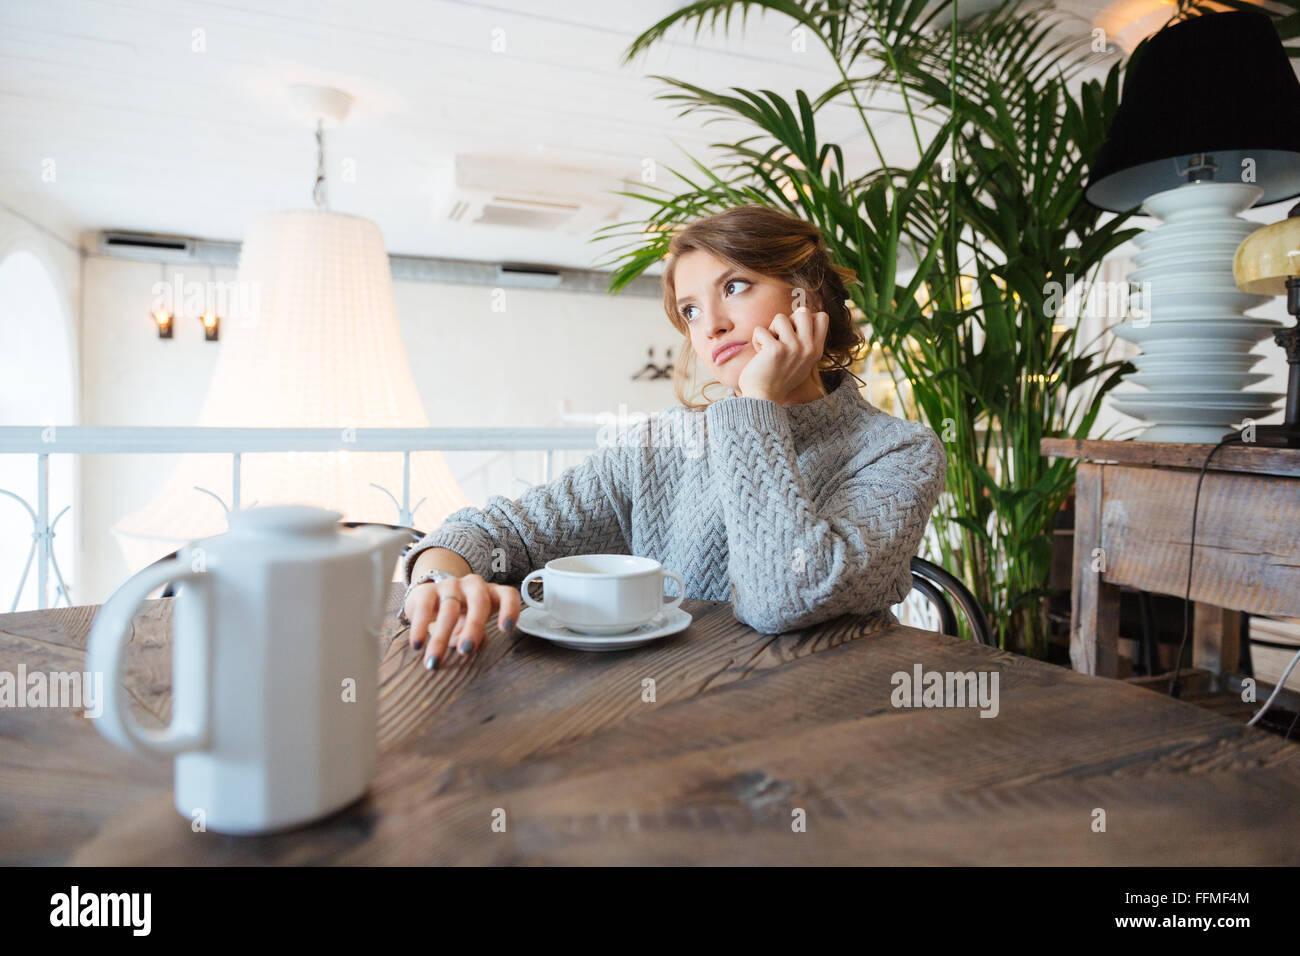 Junge Frau wartet jemand im café Stockbild